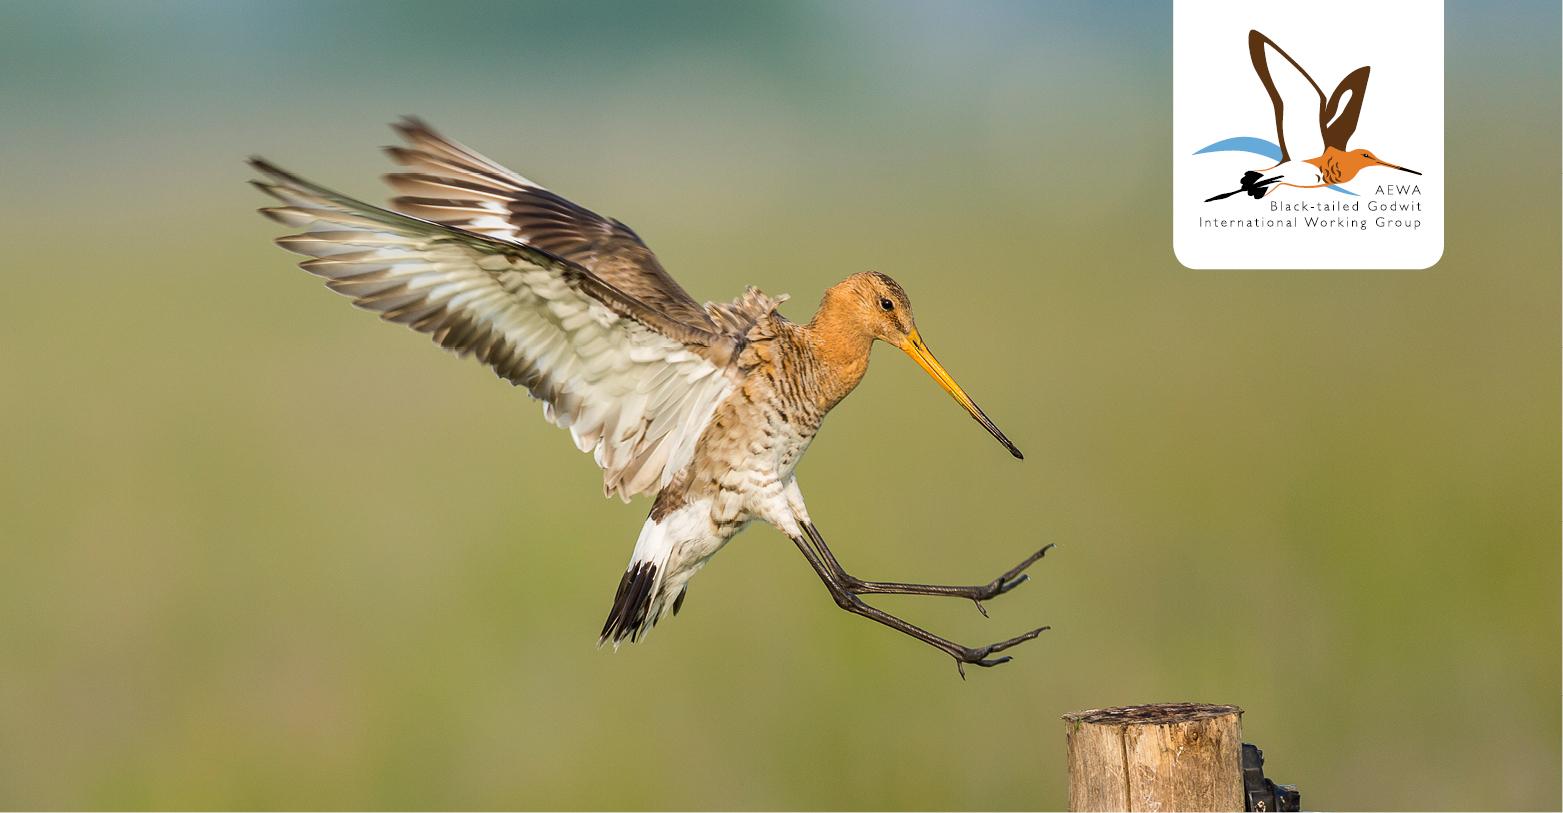 Black-tailed Godwit (Limosa limosa) © Szabolcs Nagy